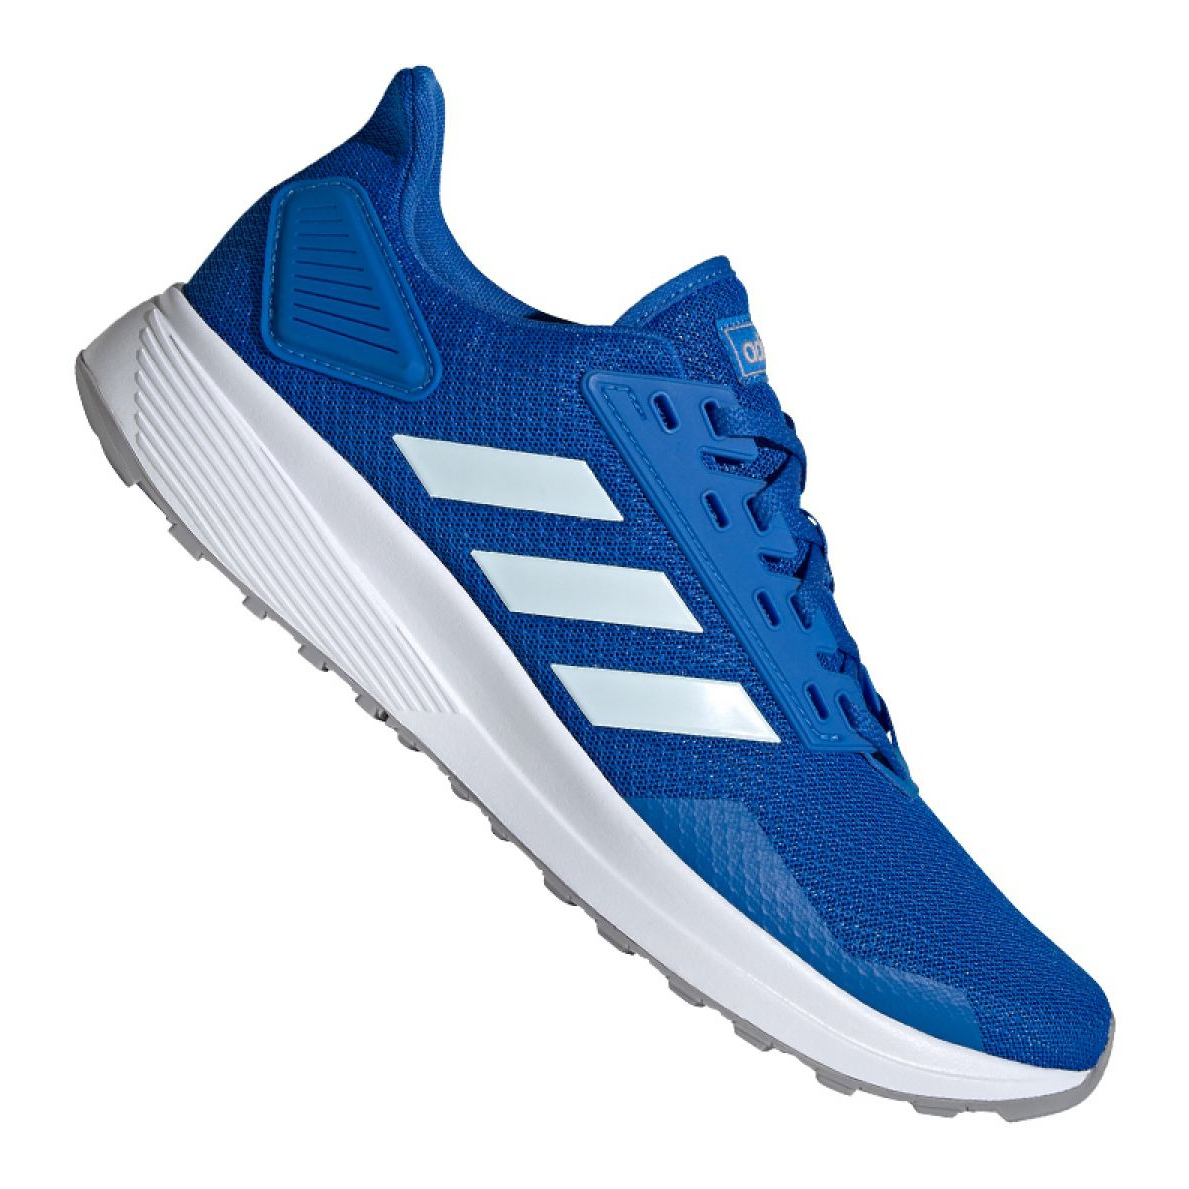 Adidas Duramo 9 M EG8664 running shoes blue